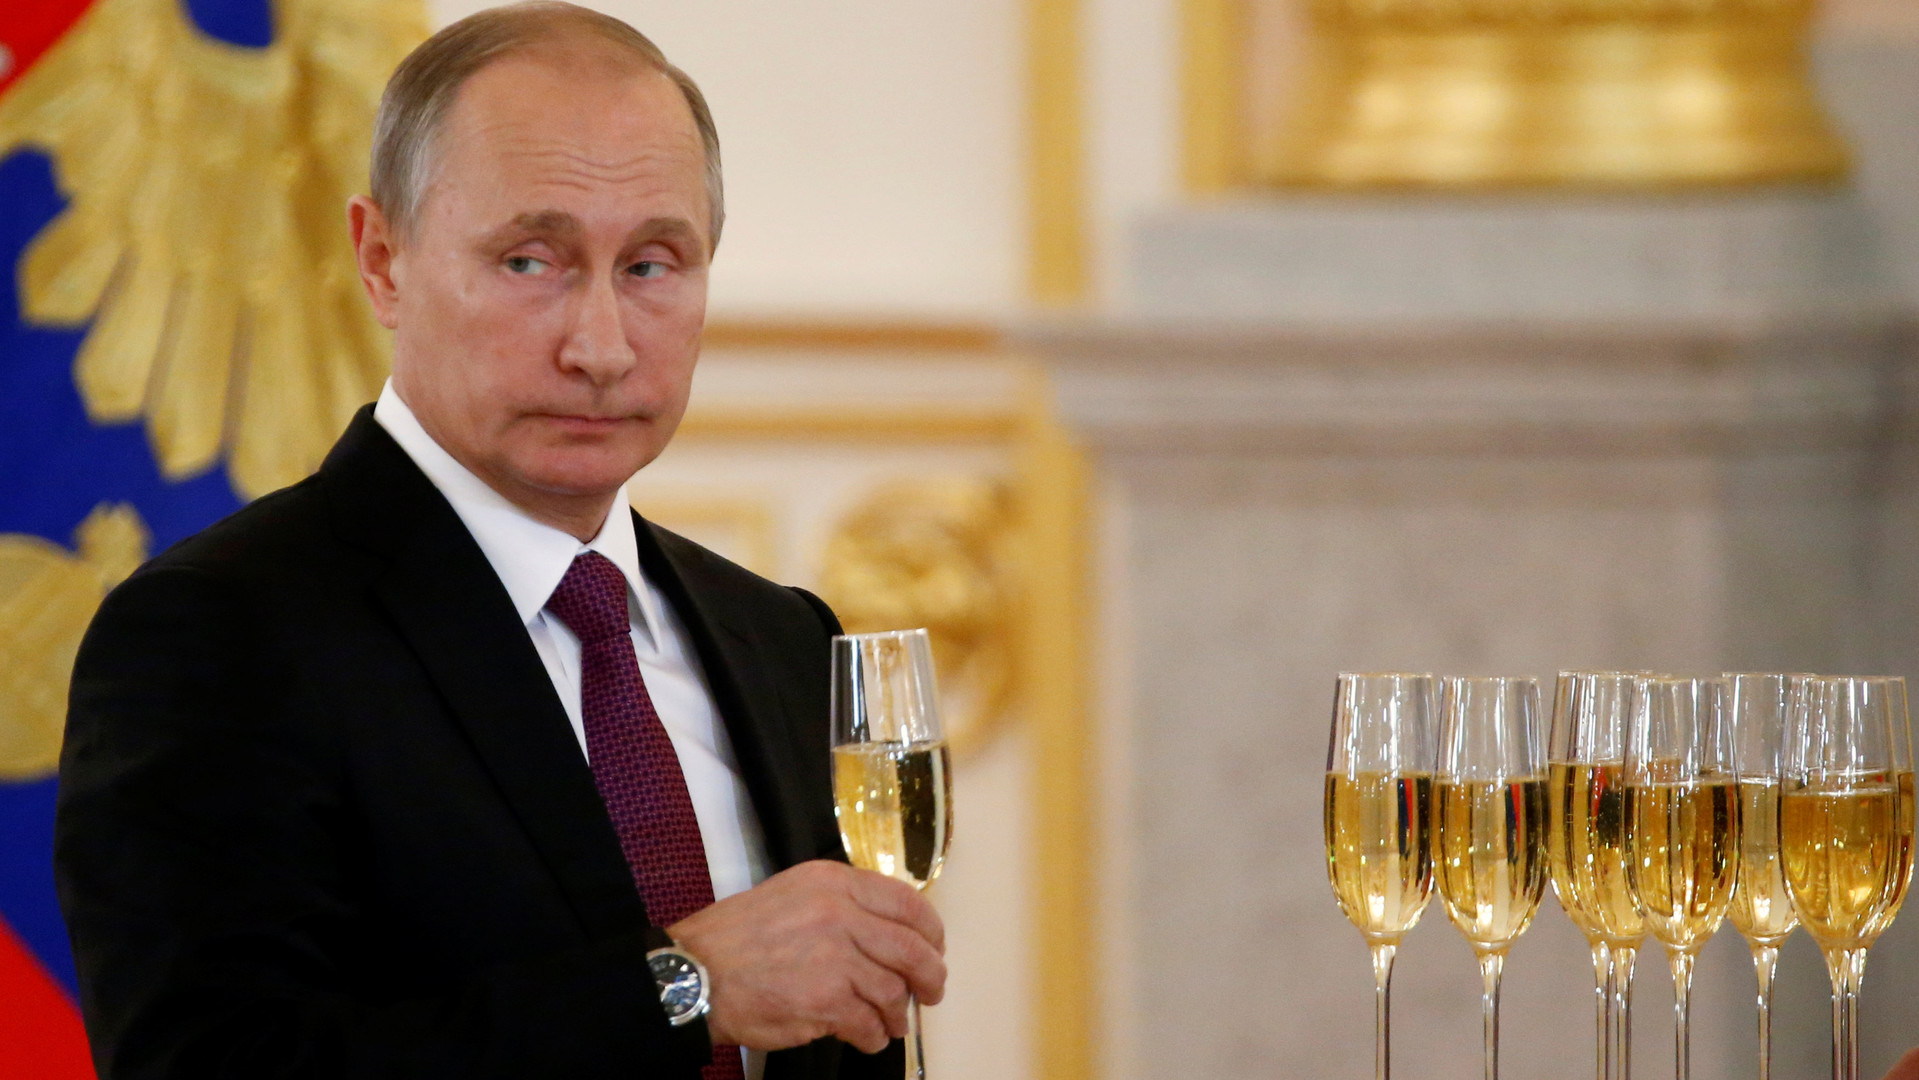 «Путин — молодец»: как победу Трампа приписали России